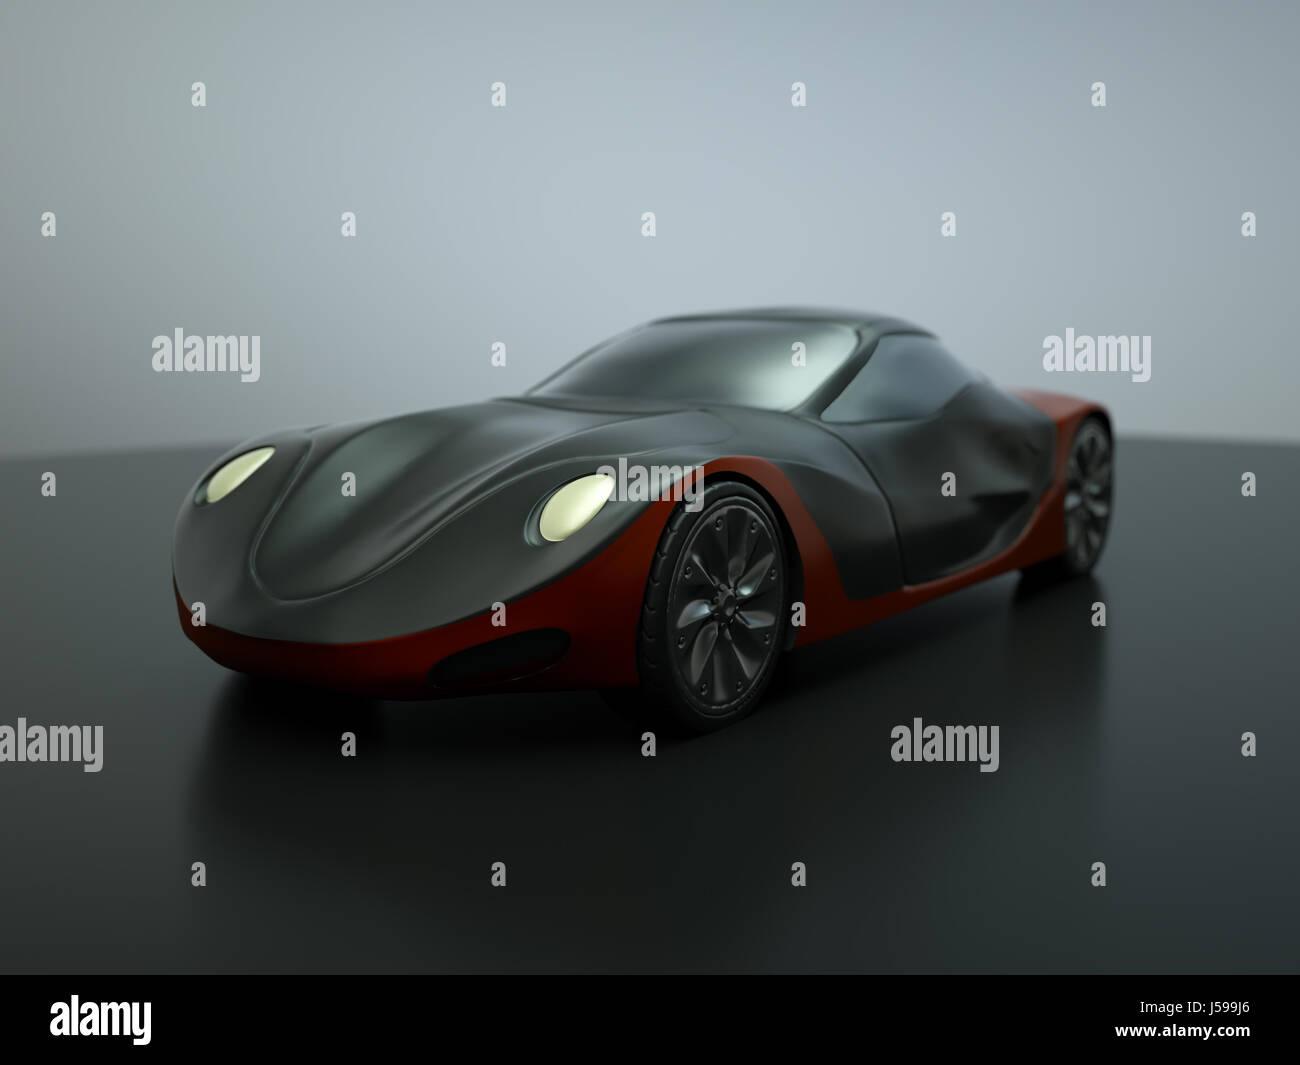 Sleek concept car - Stock Image